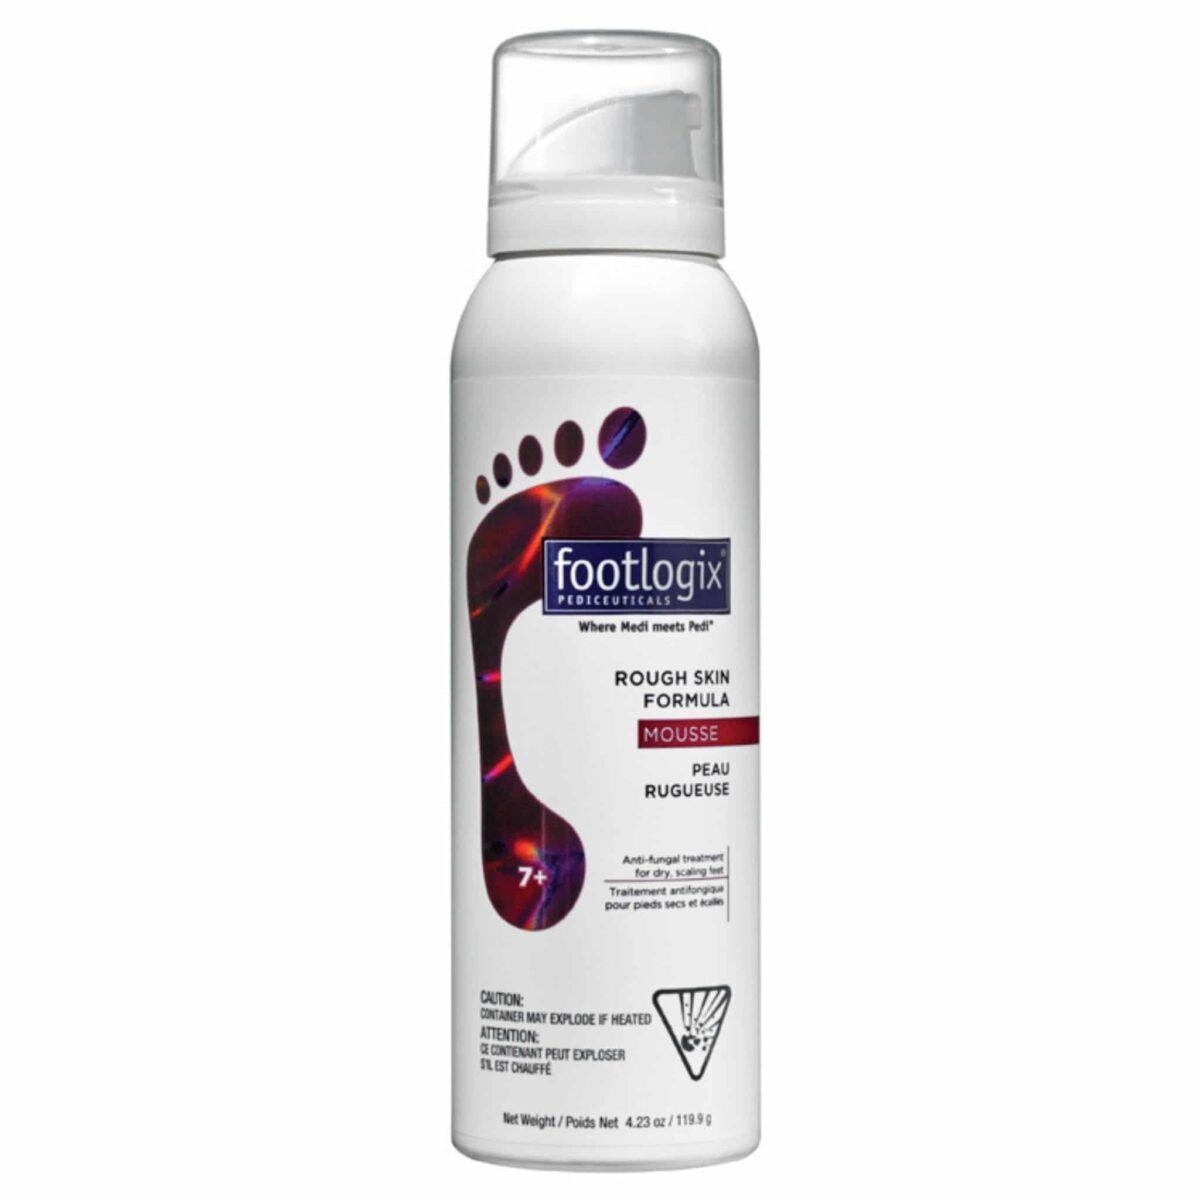 Footlogix Rough Skin Formula